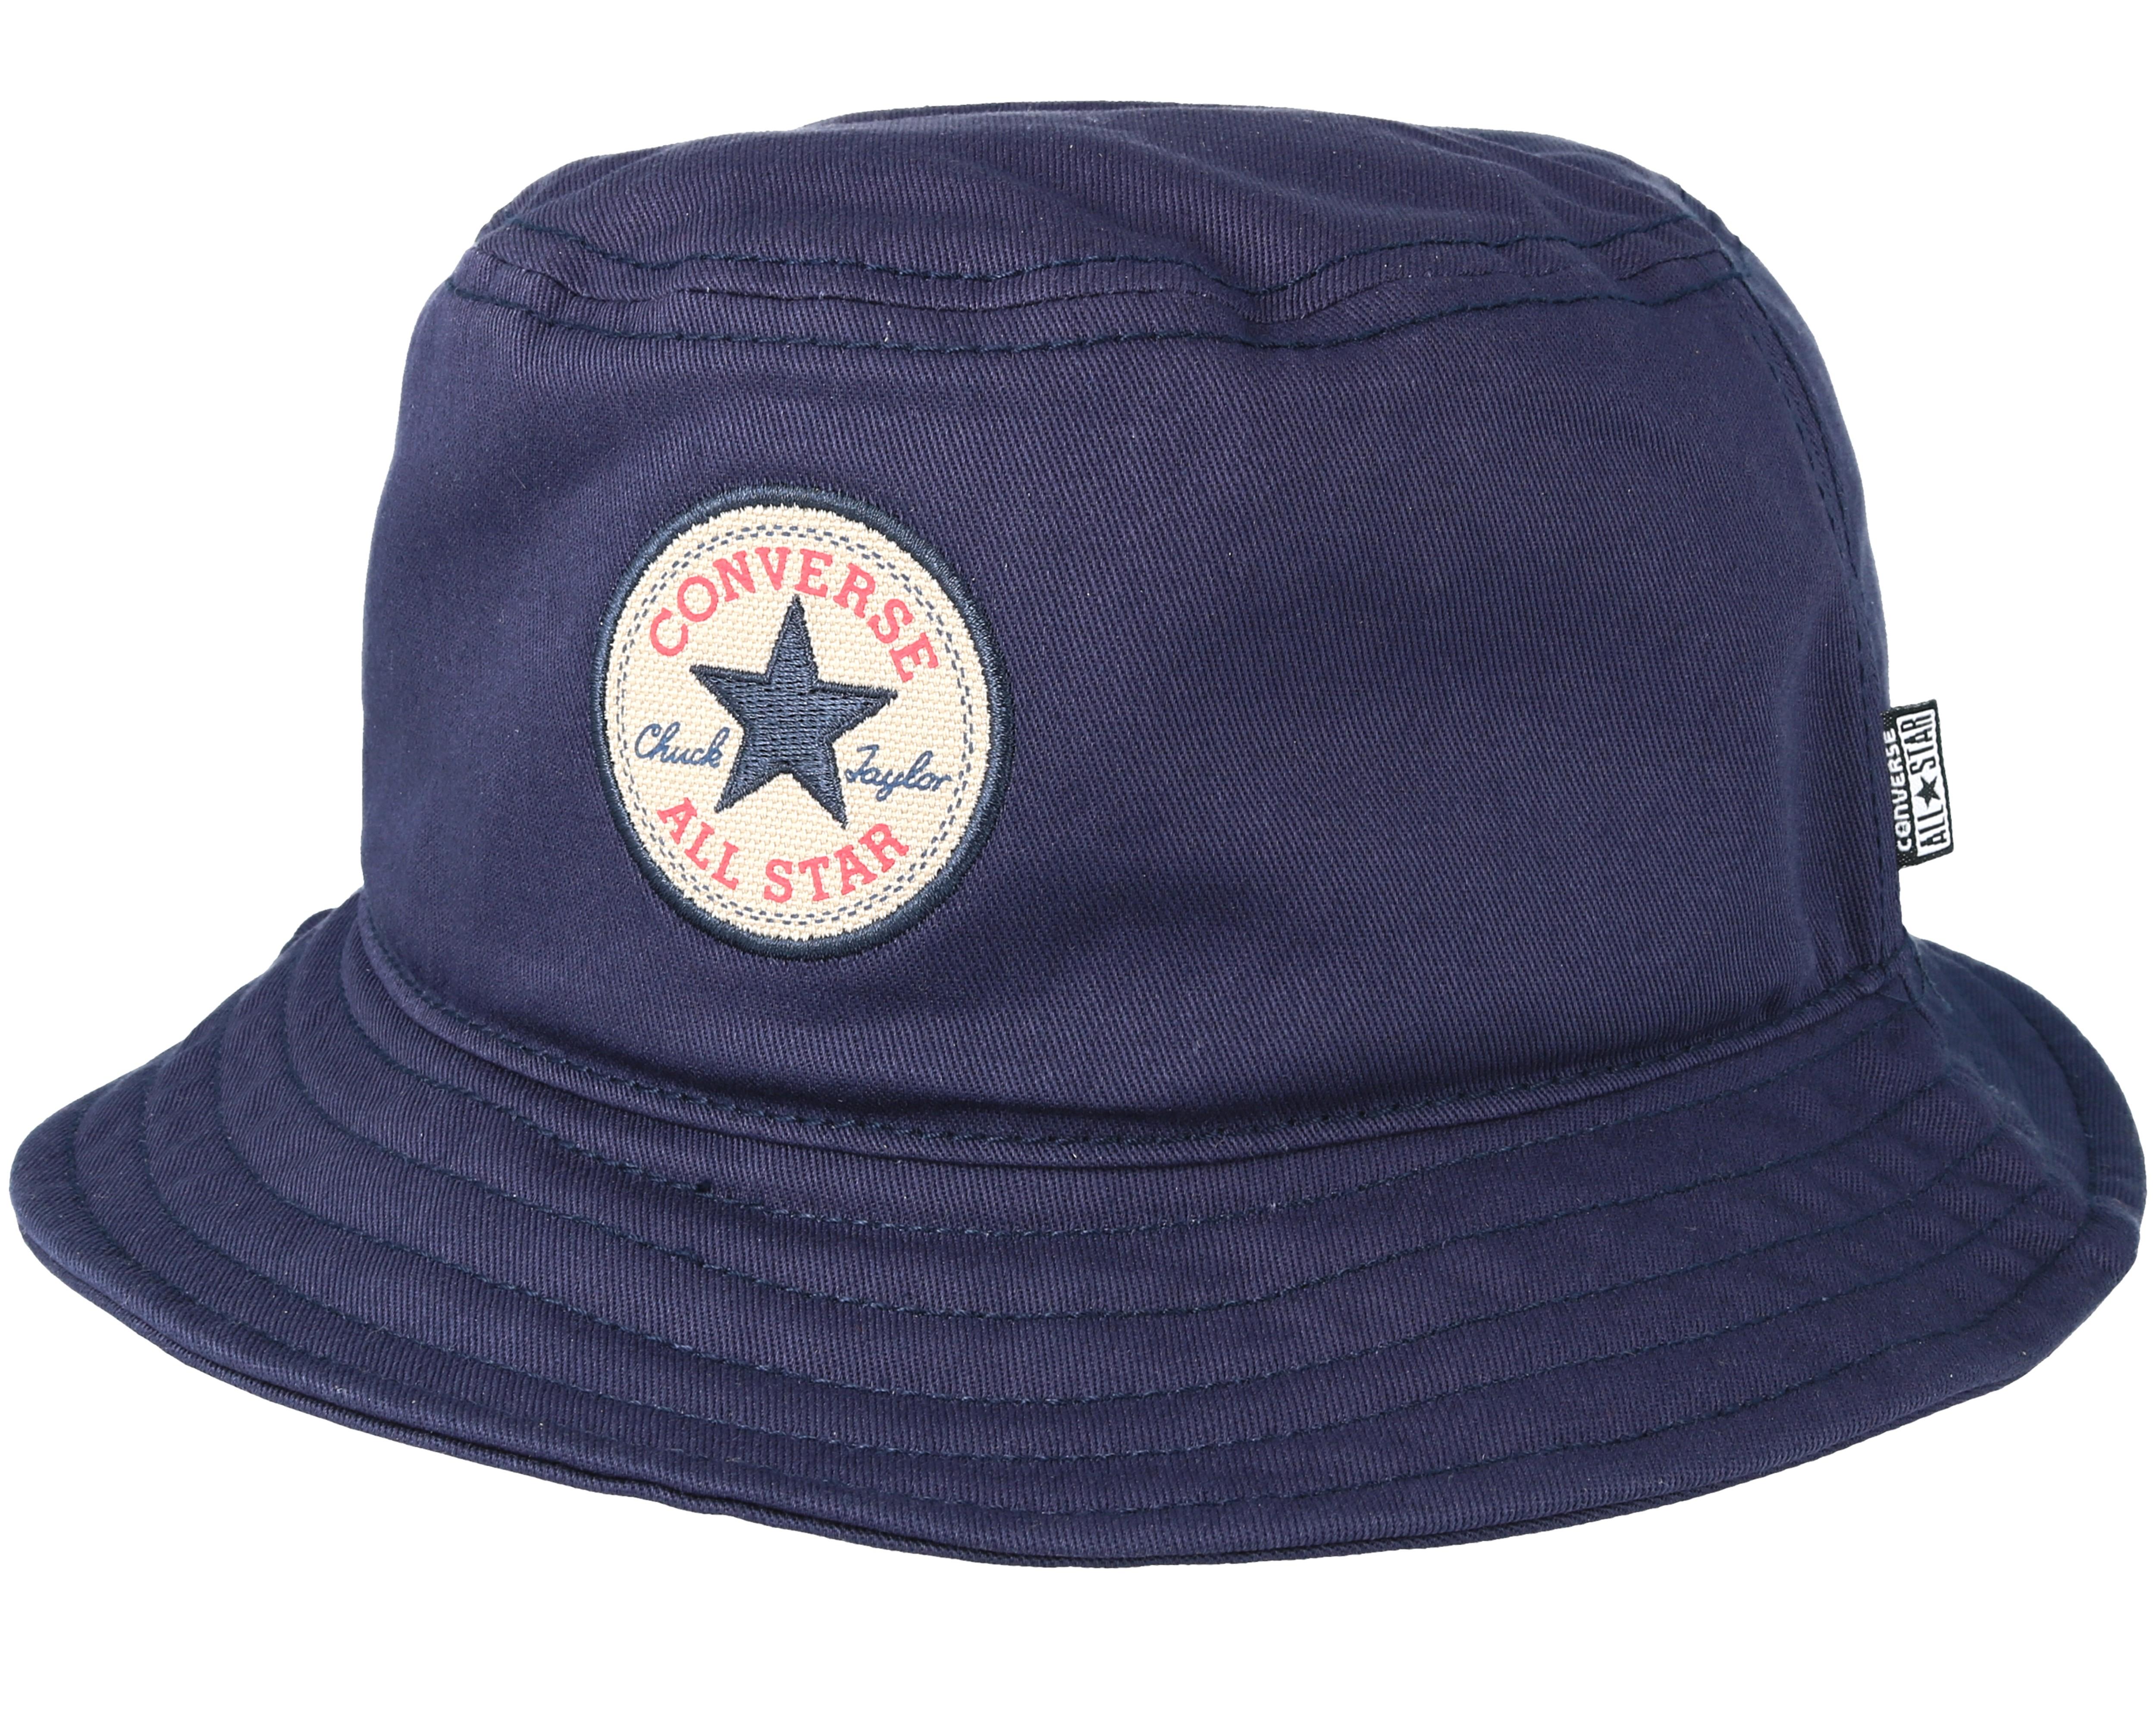 Navy Bucket - Converse hats  5391a0feec0